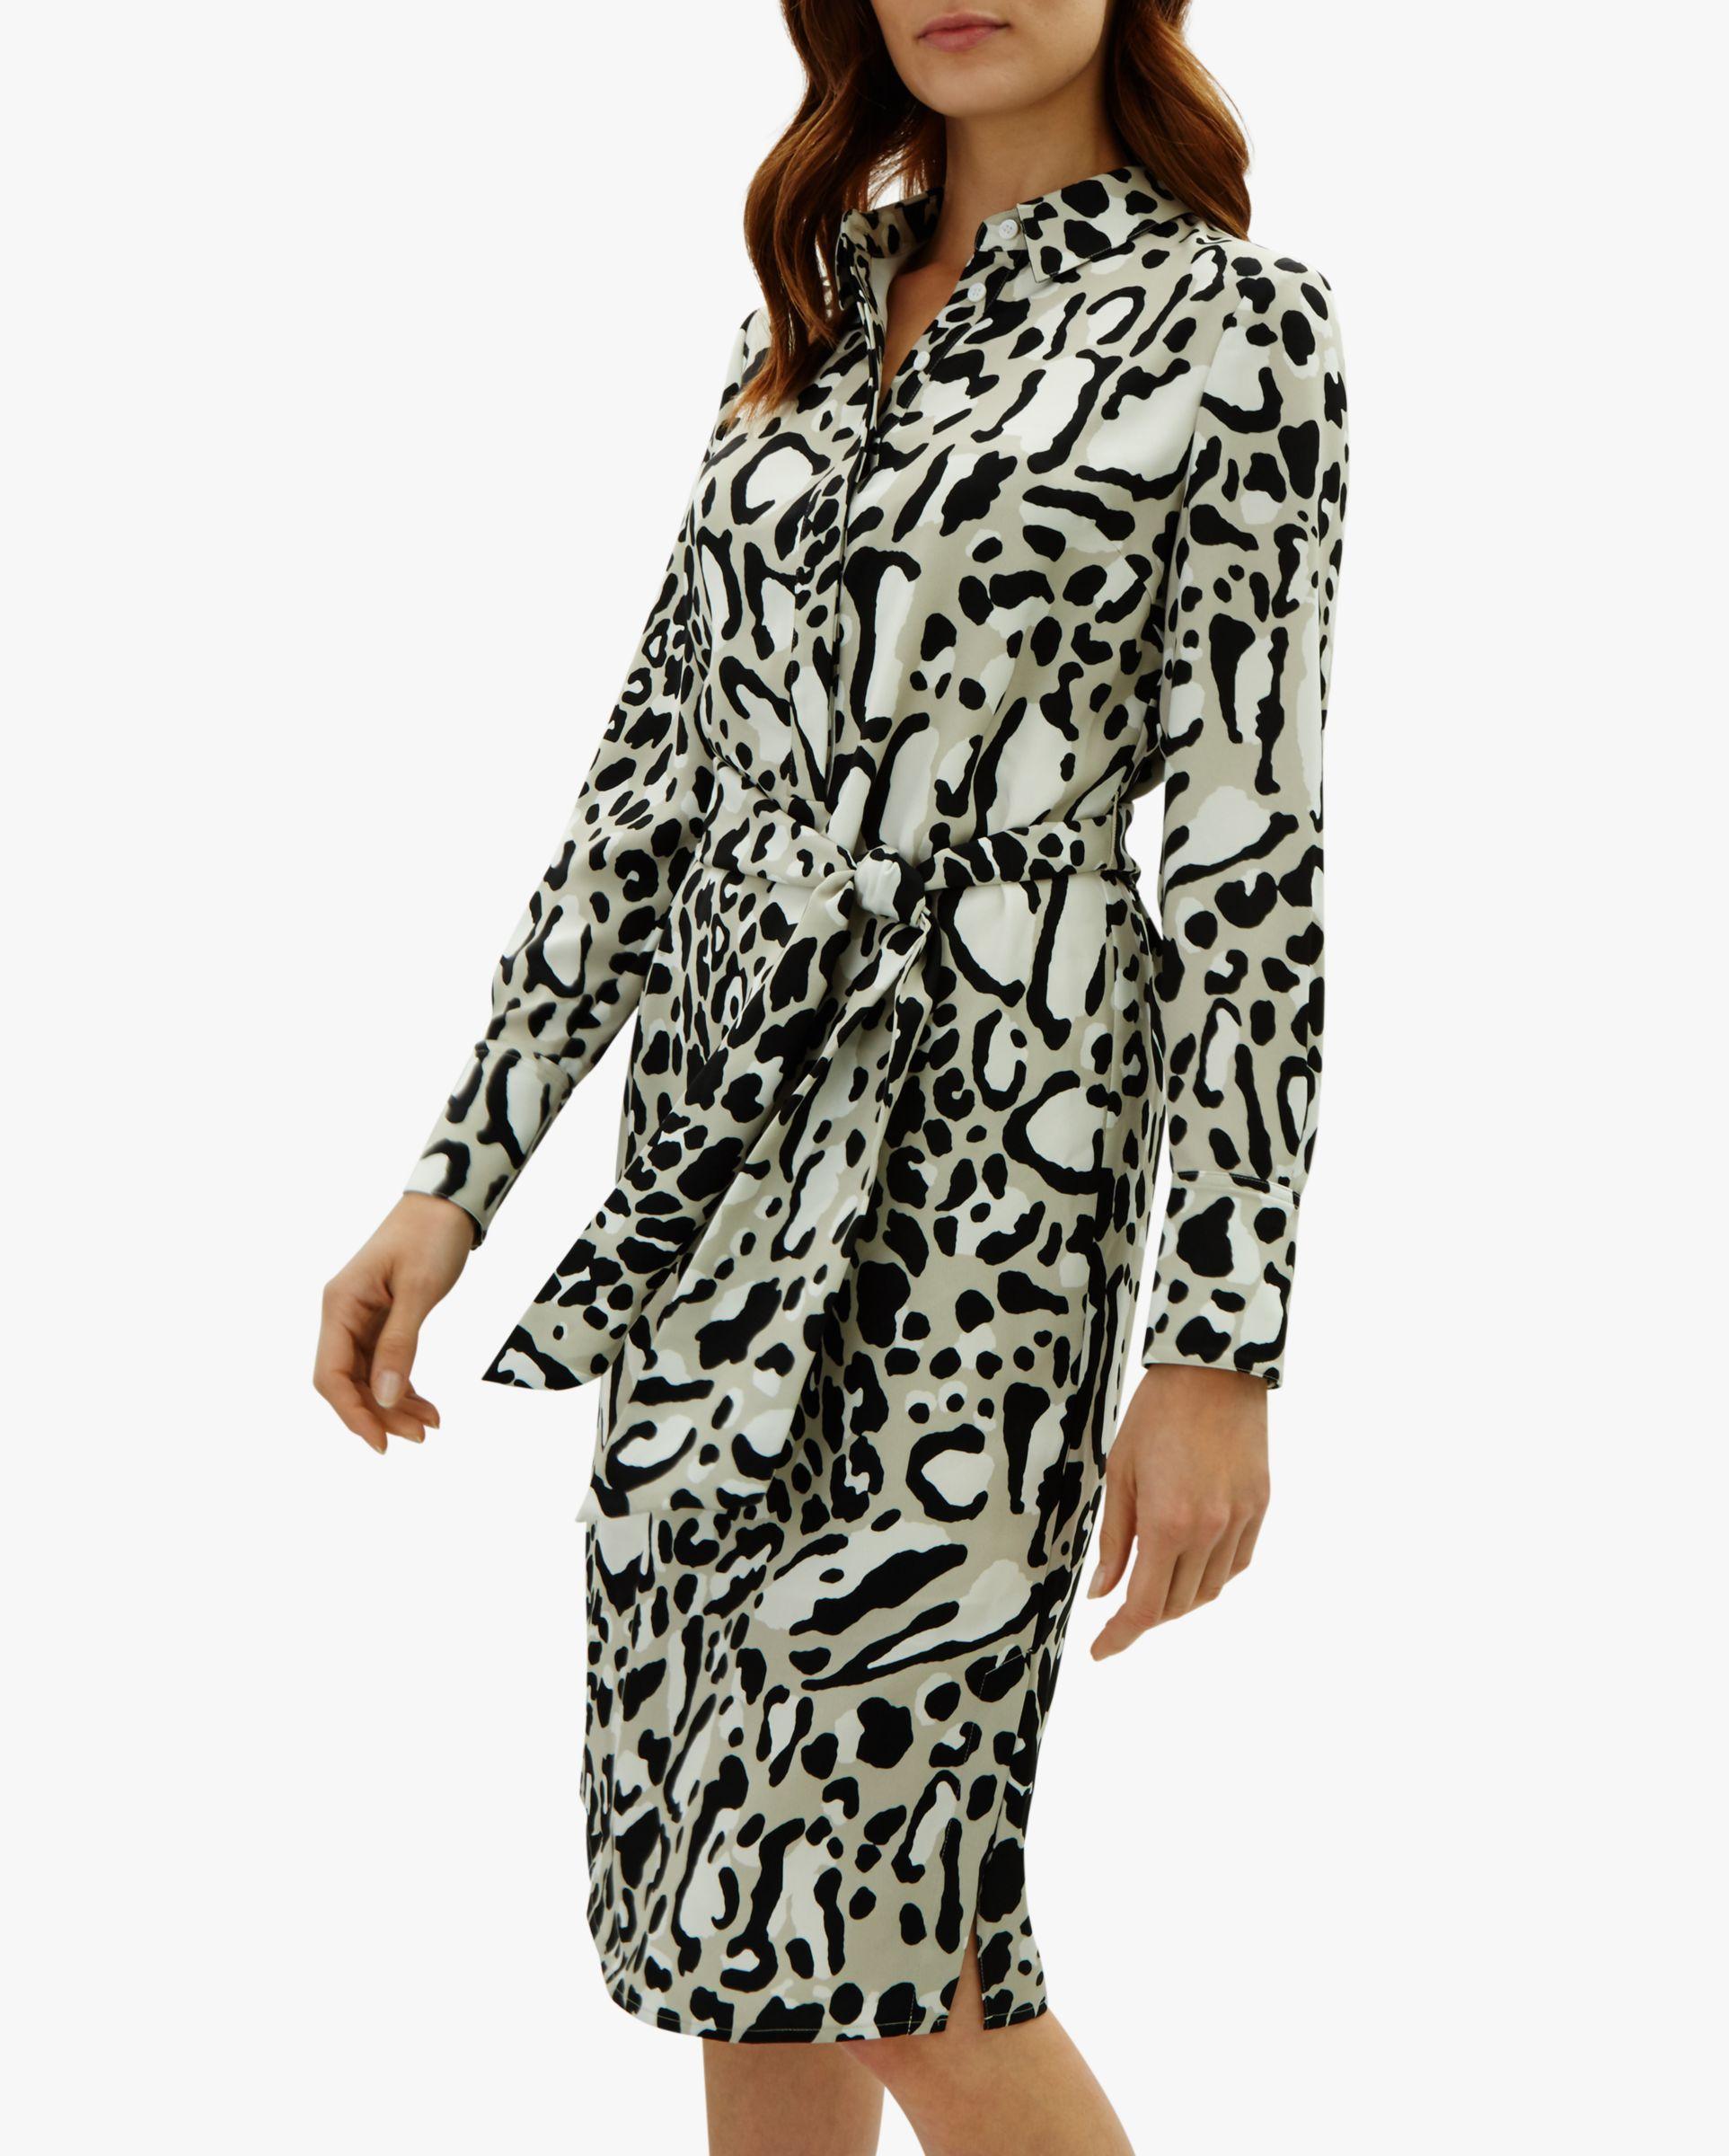 Jaeger. Women s Leopard Print Dress bc0e26538